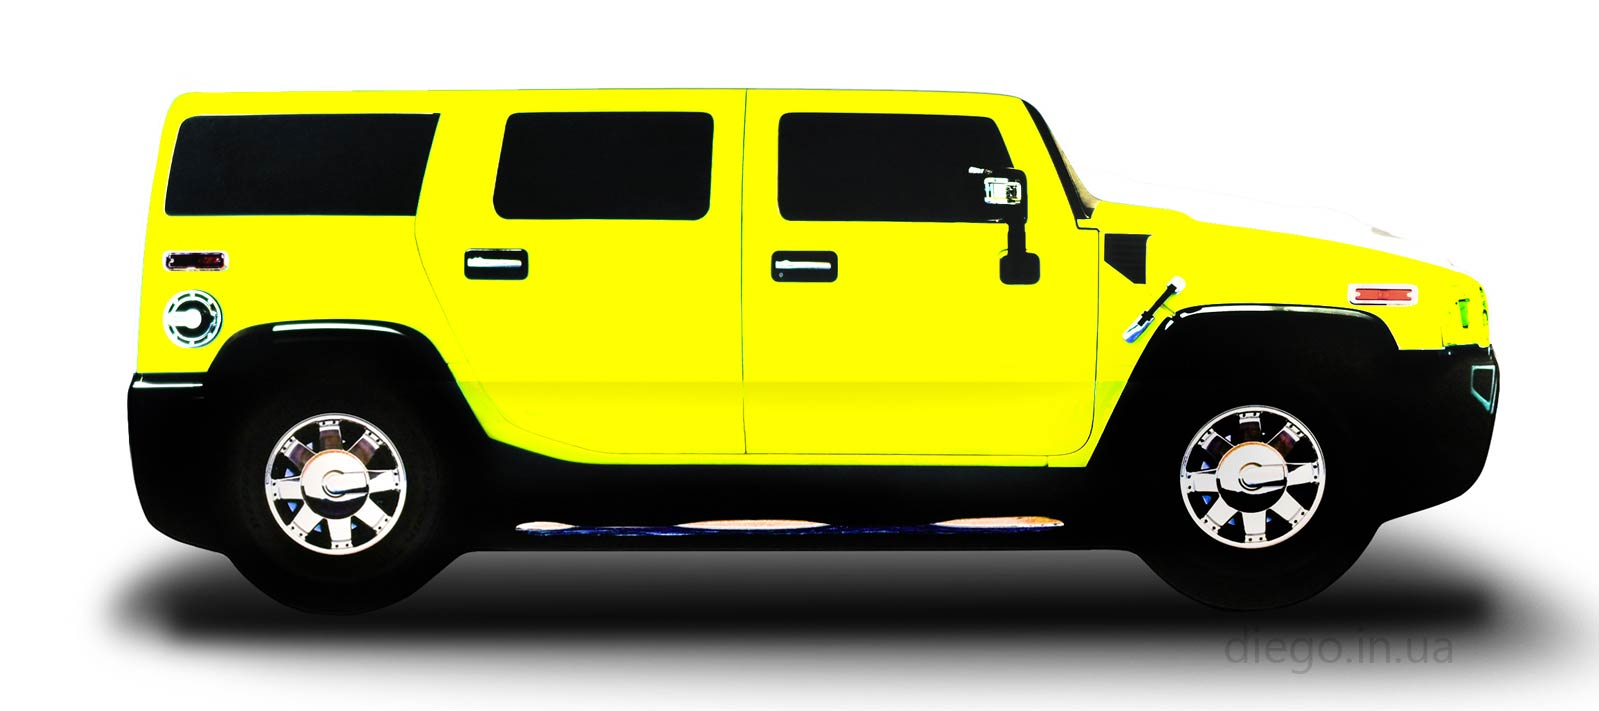 Джип желтого цвета